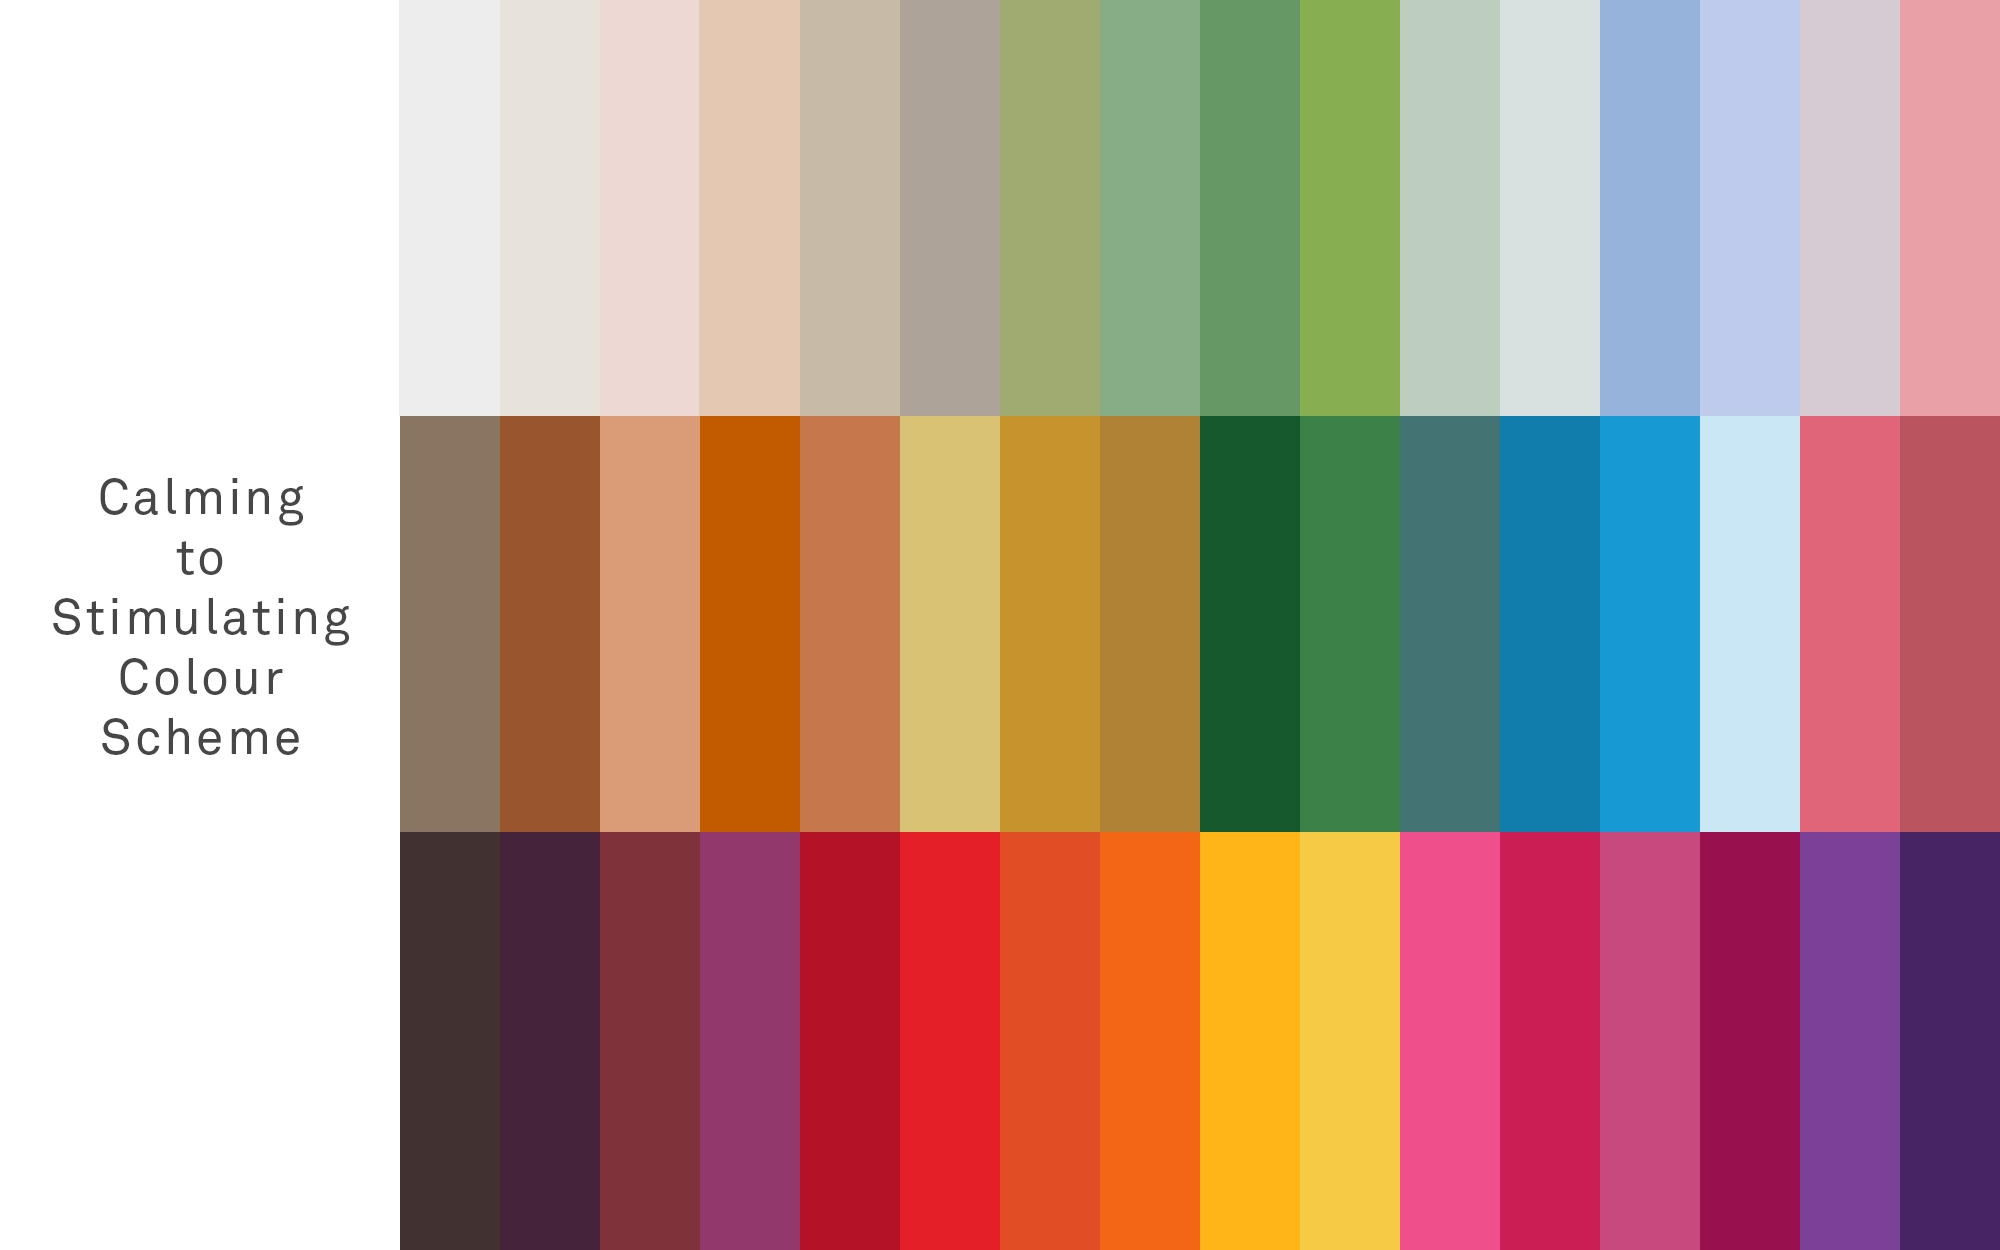 Colour Chart Explaining Calming To Stimulating Colours